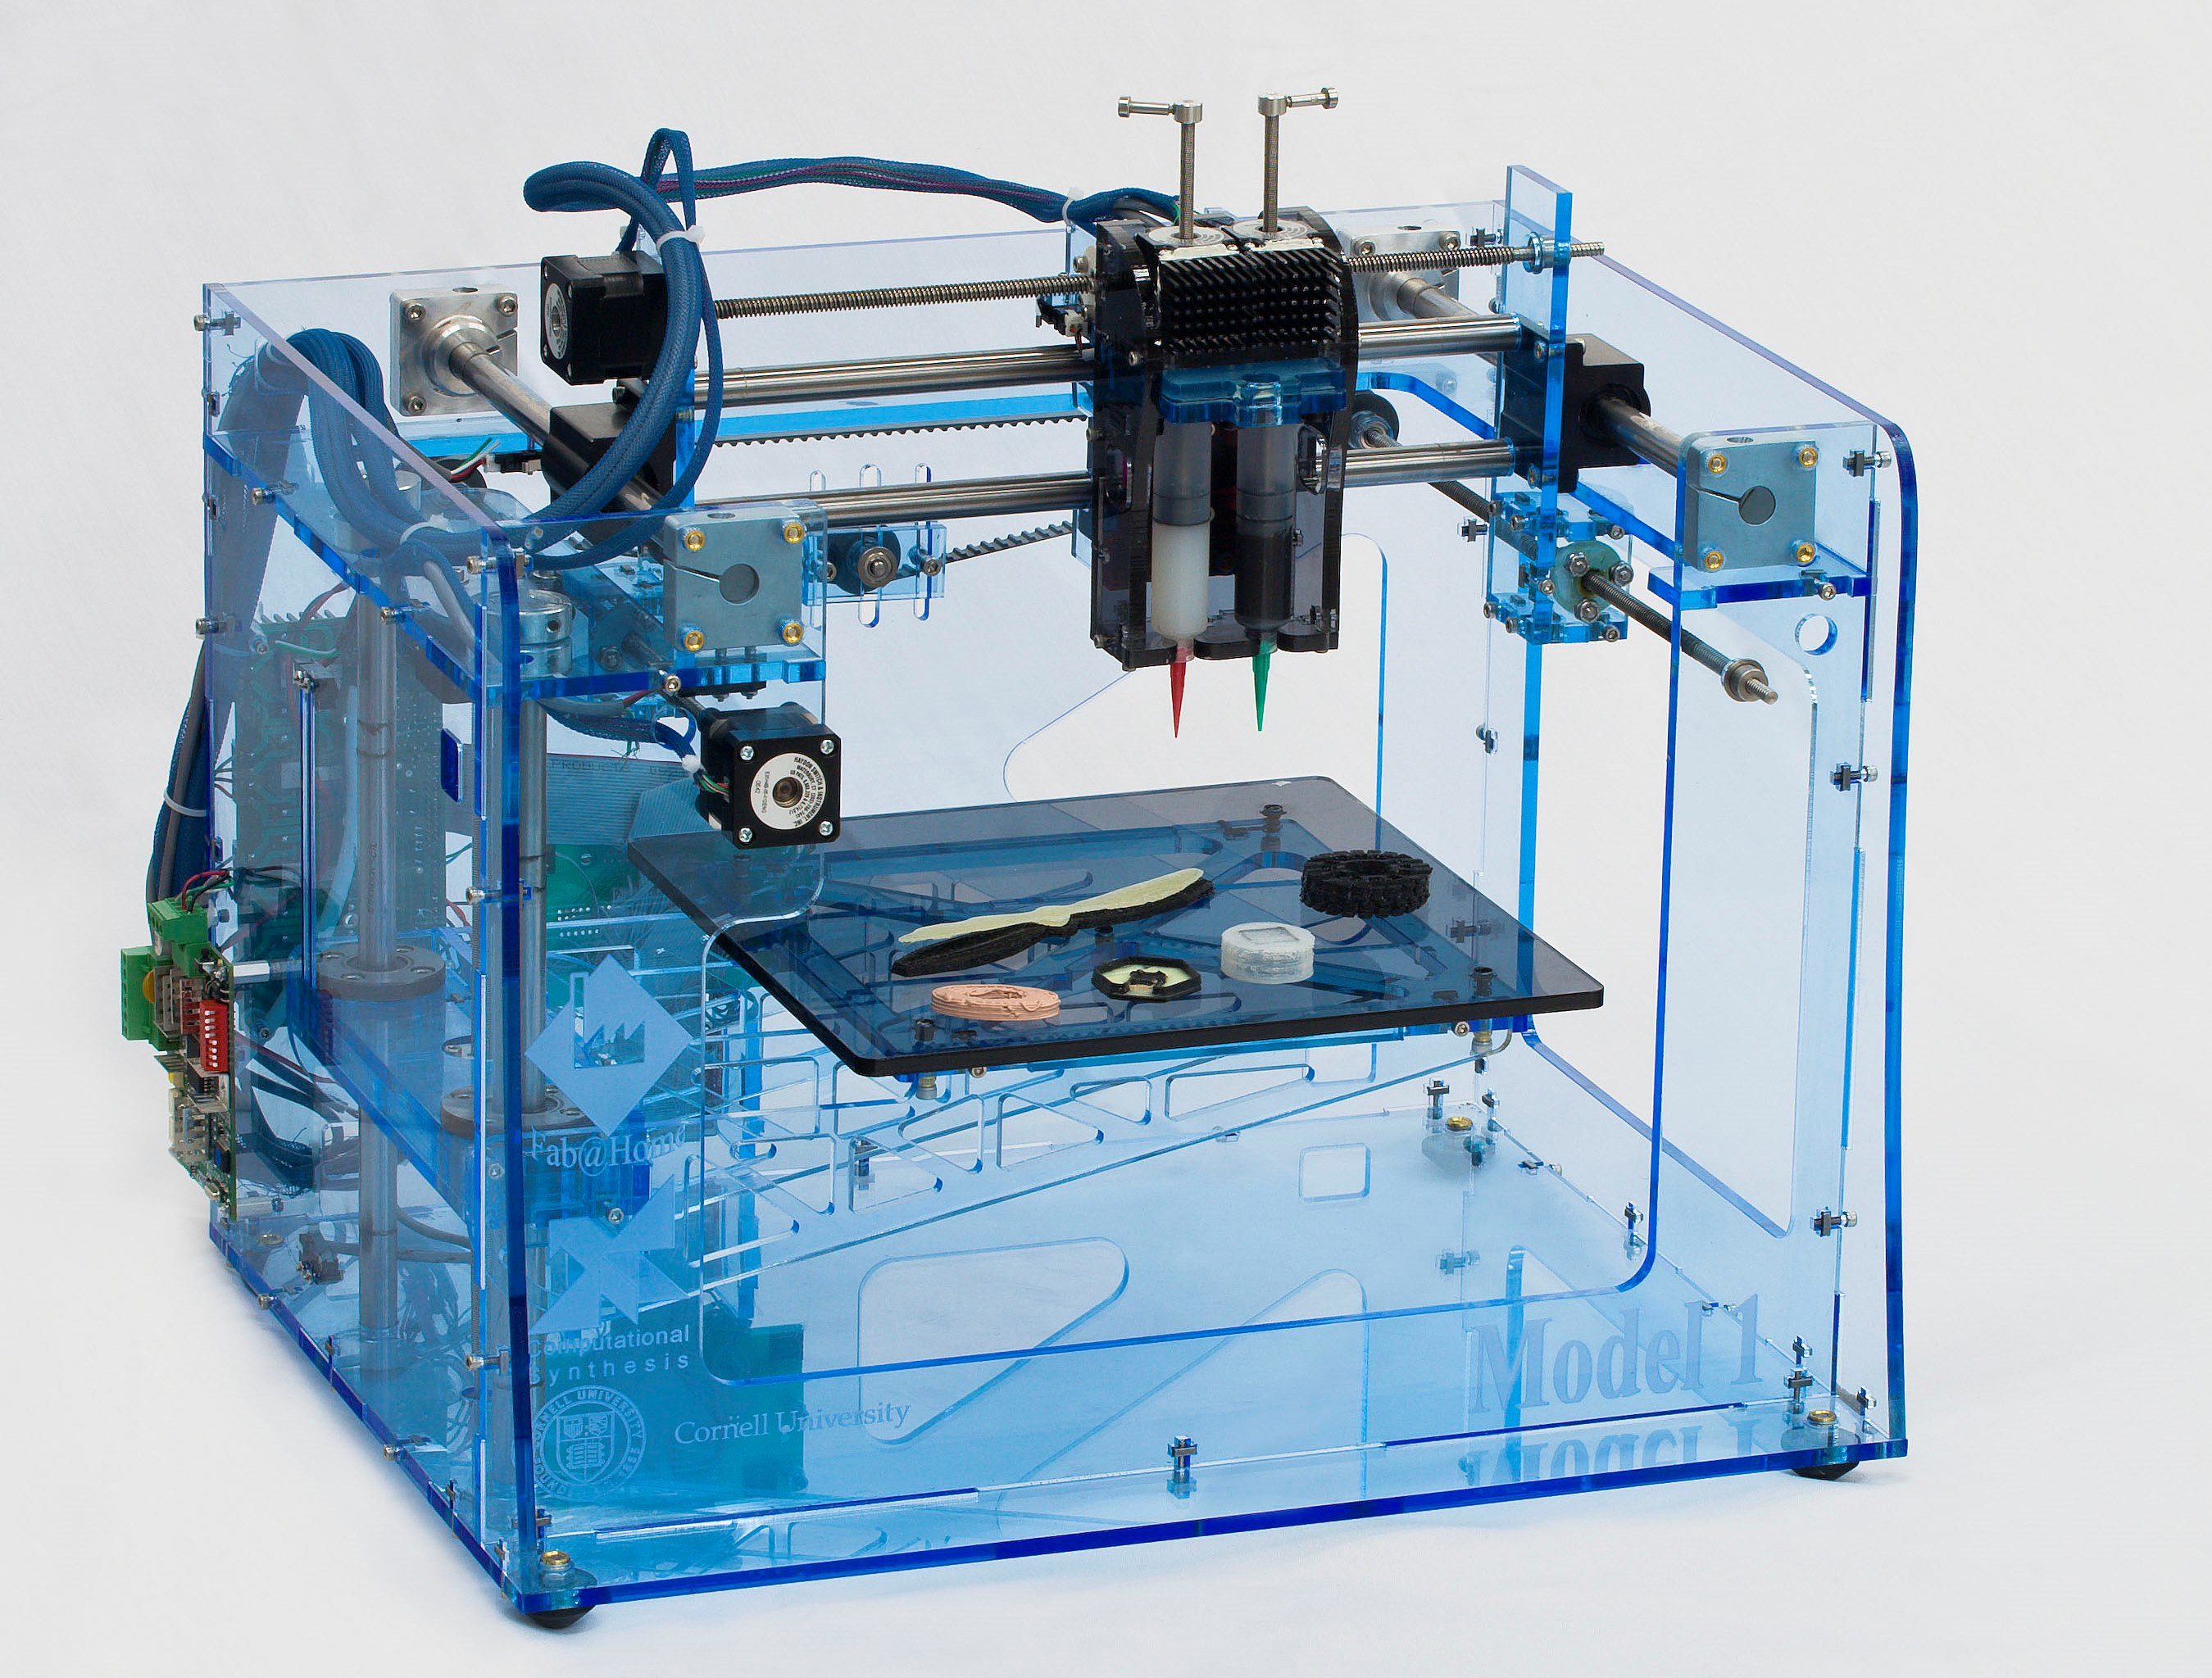 картинка для печати на принтере